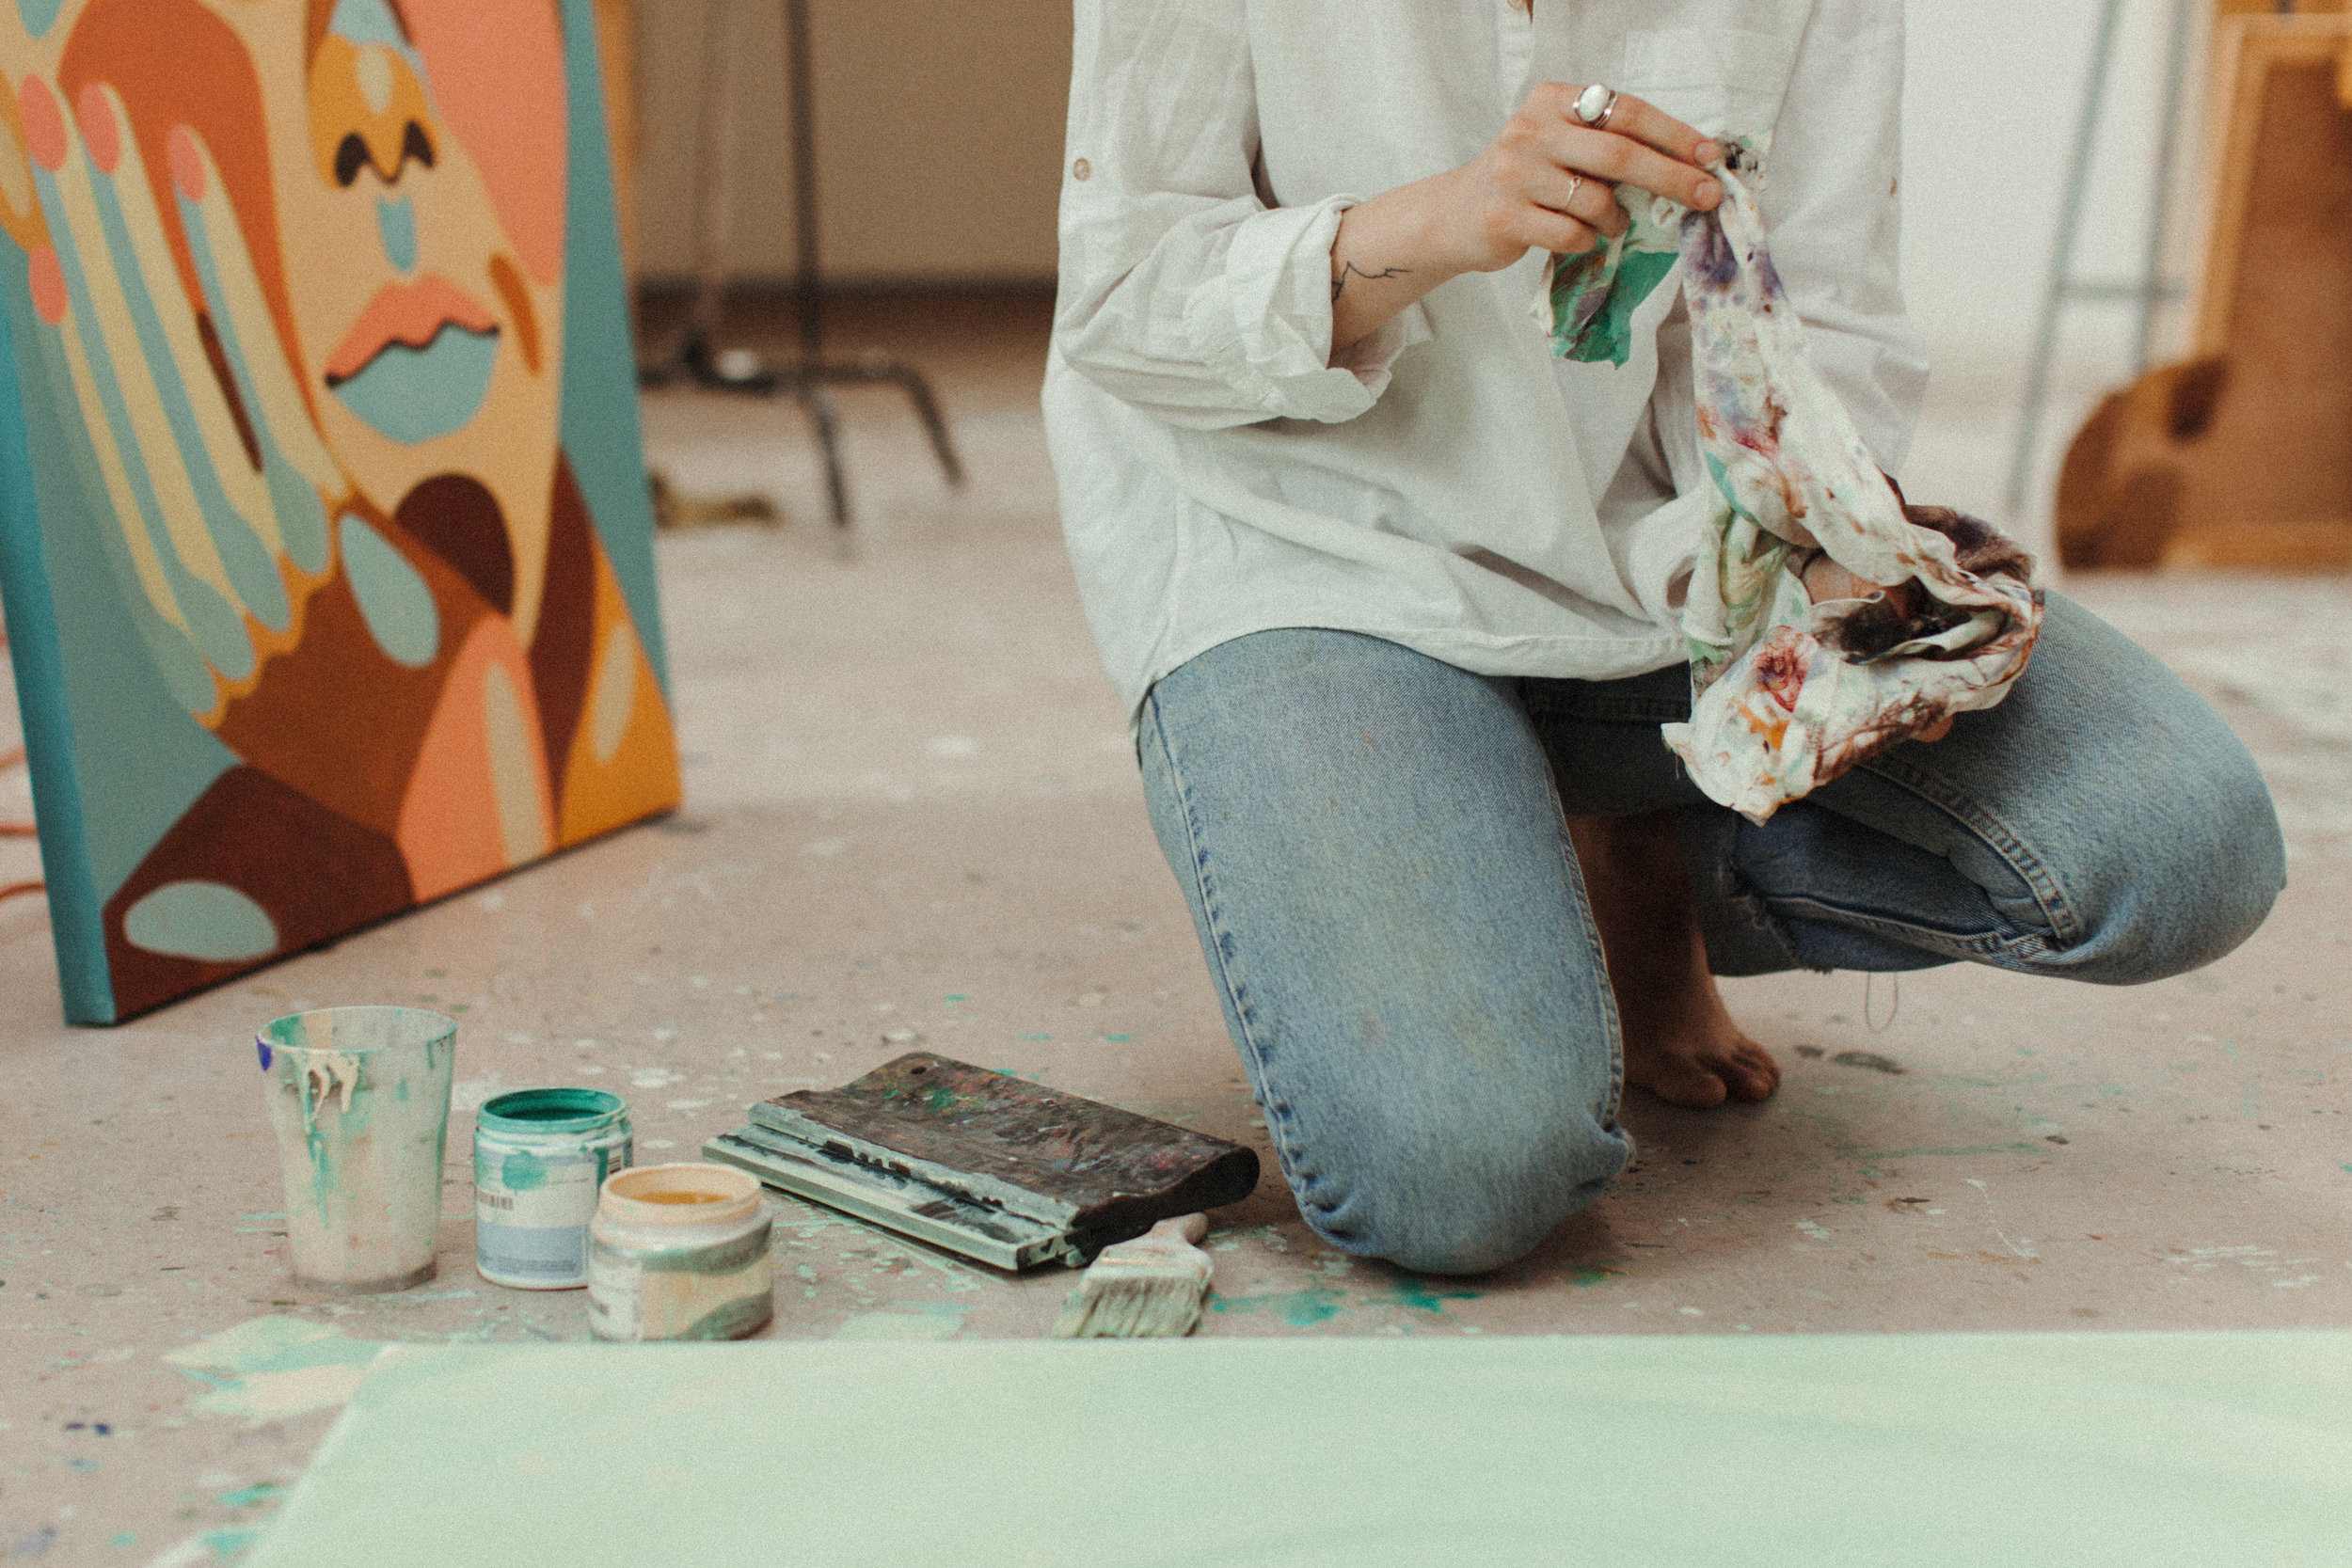 emily-pawlica-art-process-2019-peytoncurry-0479.jpg